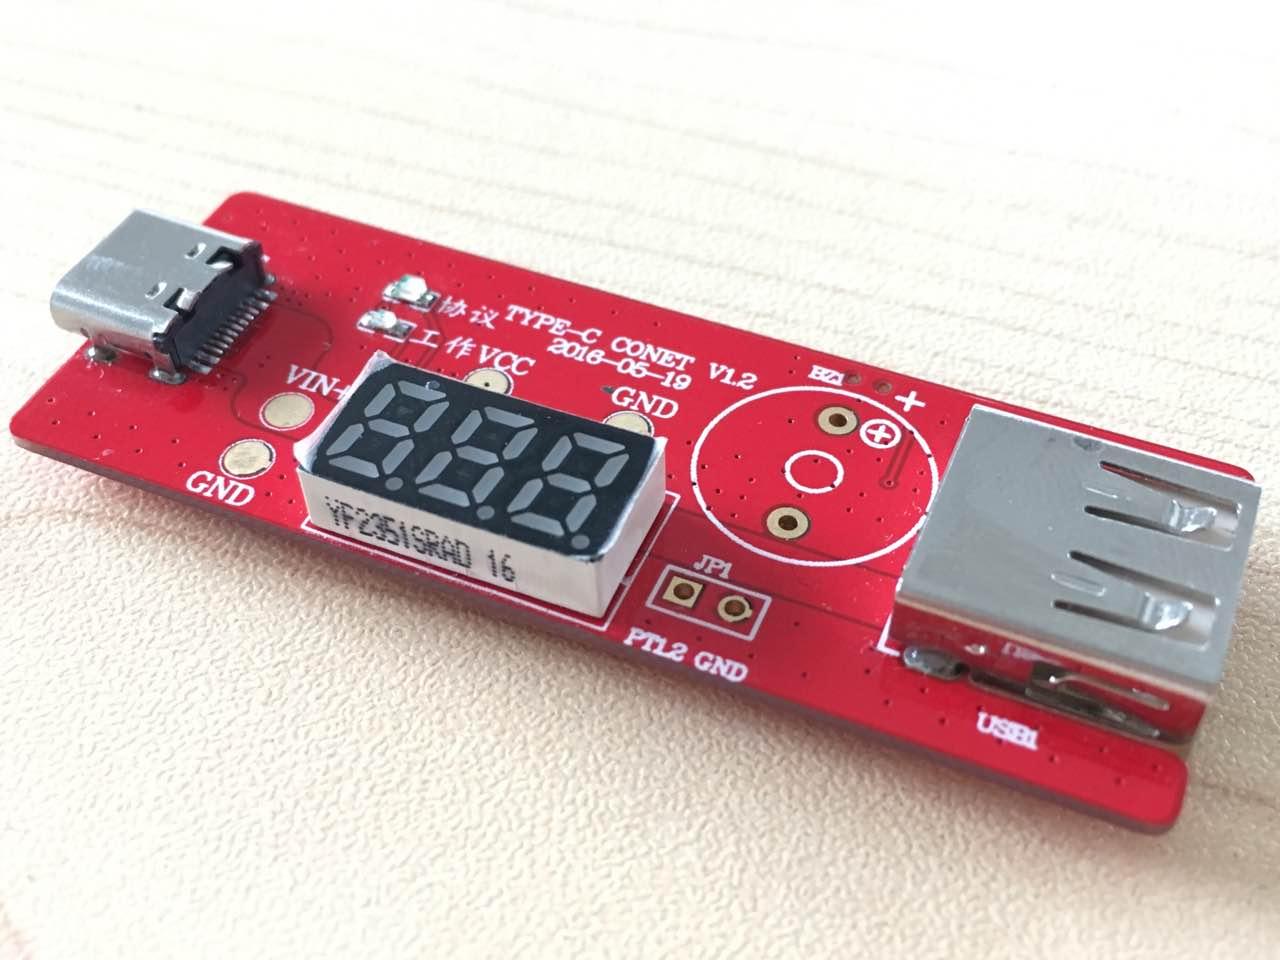 PD Type-c USB Test Board Burn-in Board Trap Tester Protocol Board Polling Device<br>